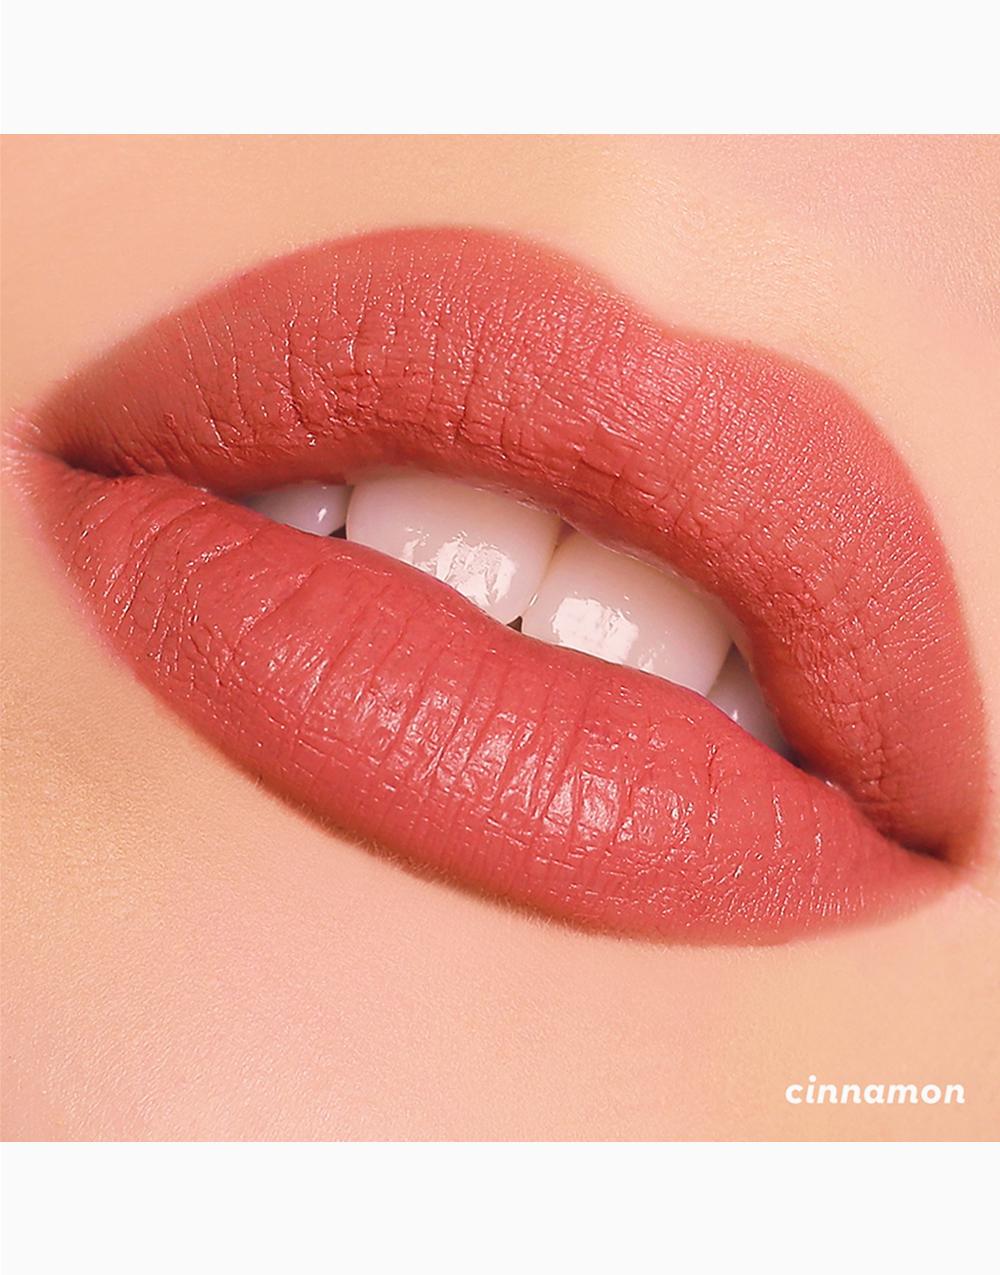 Lip Mallow Mousse by Happy Skin | Cinnamon